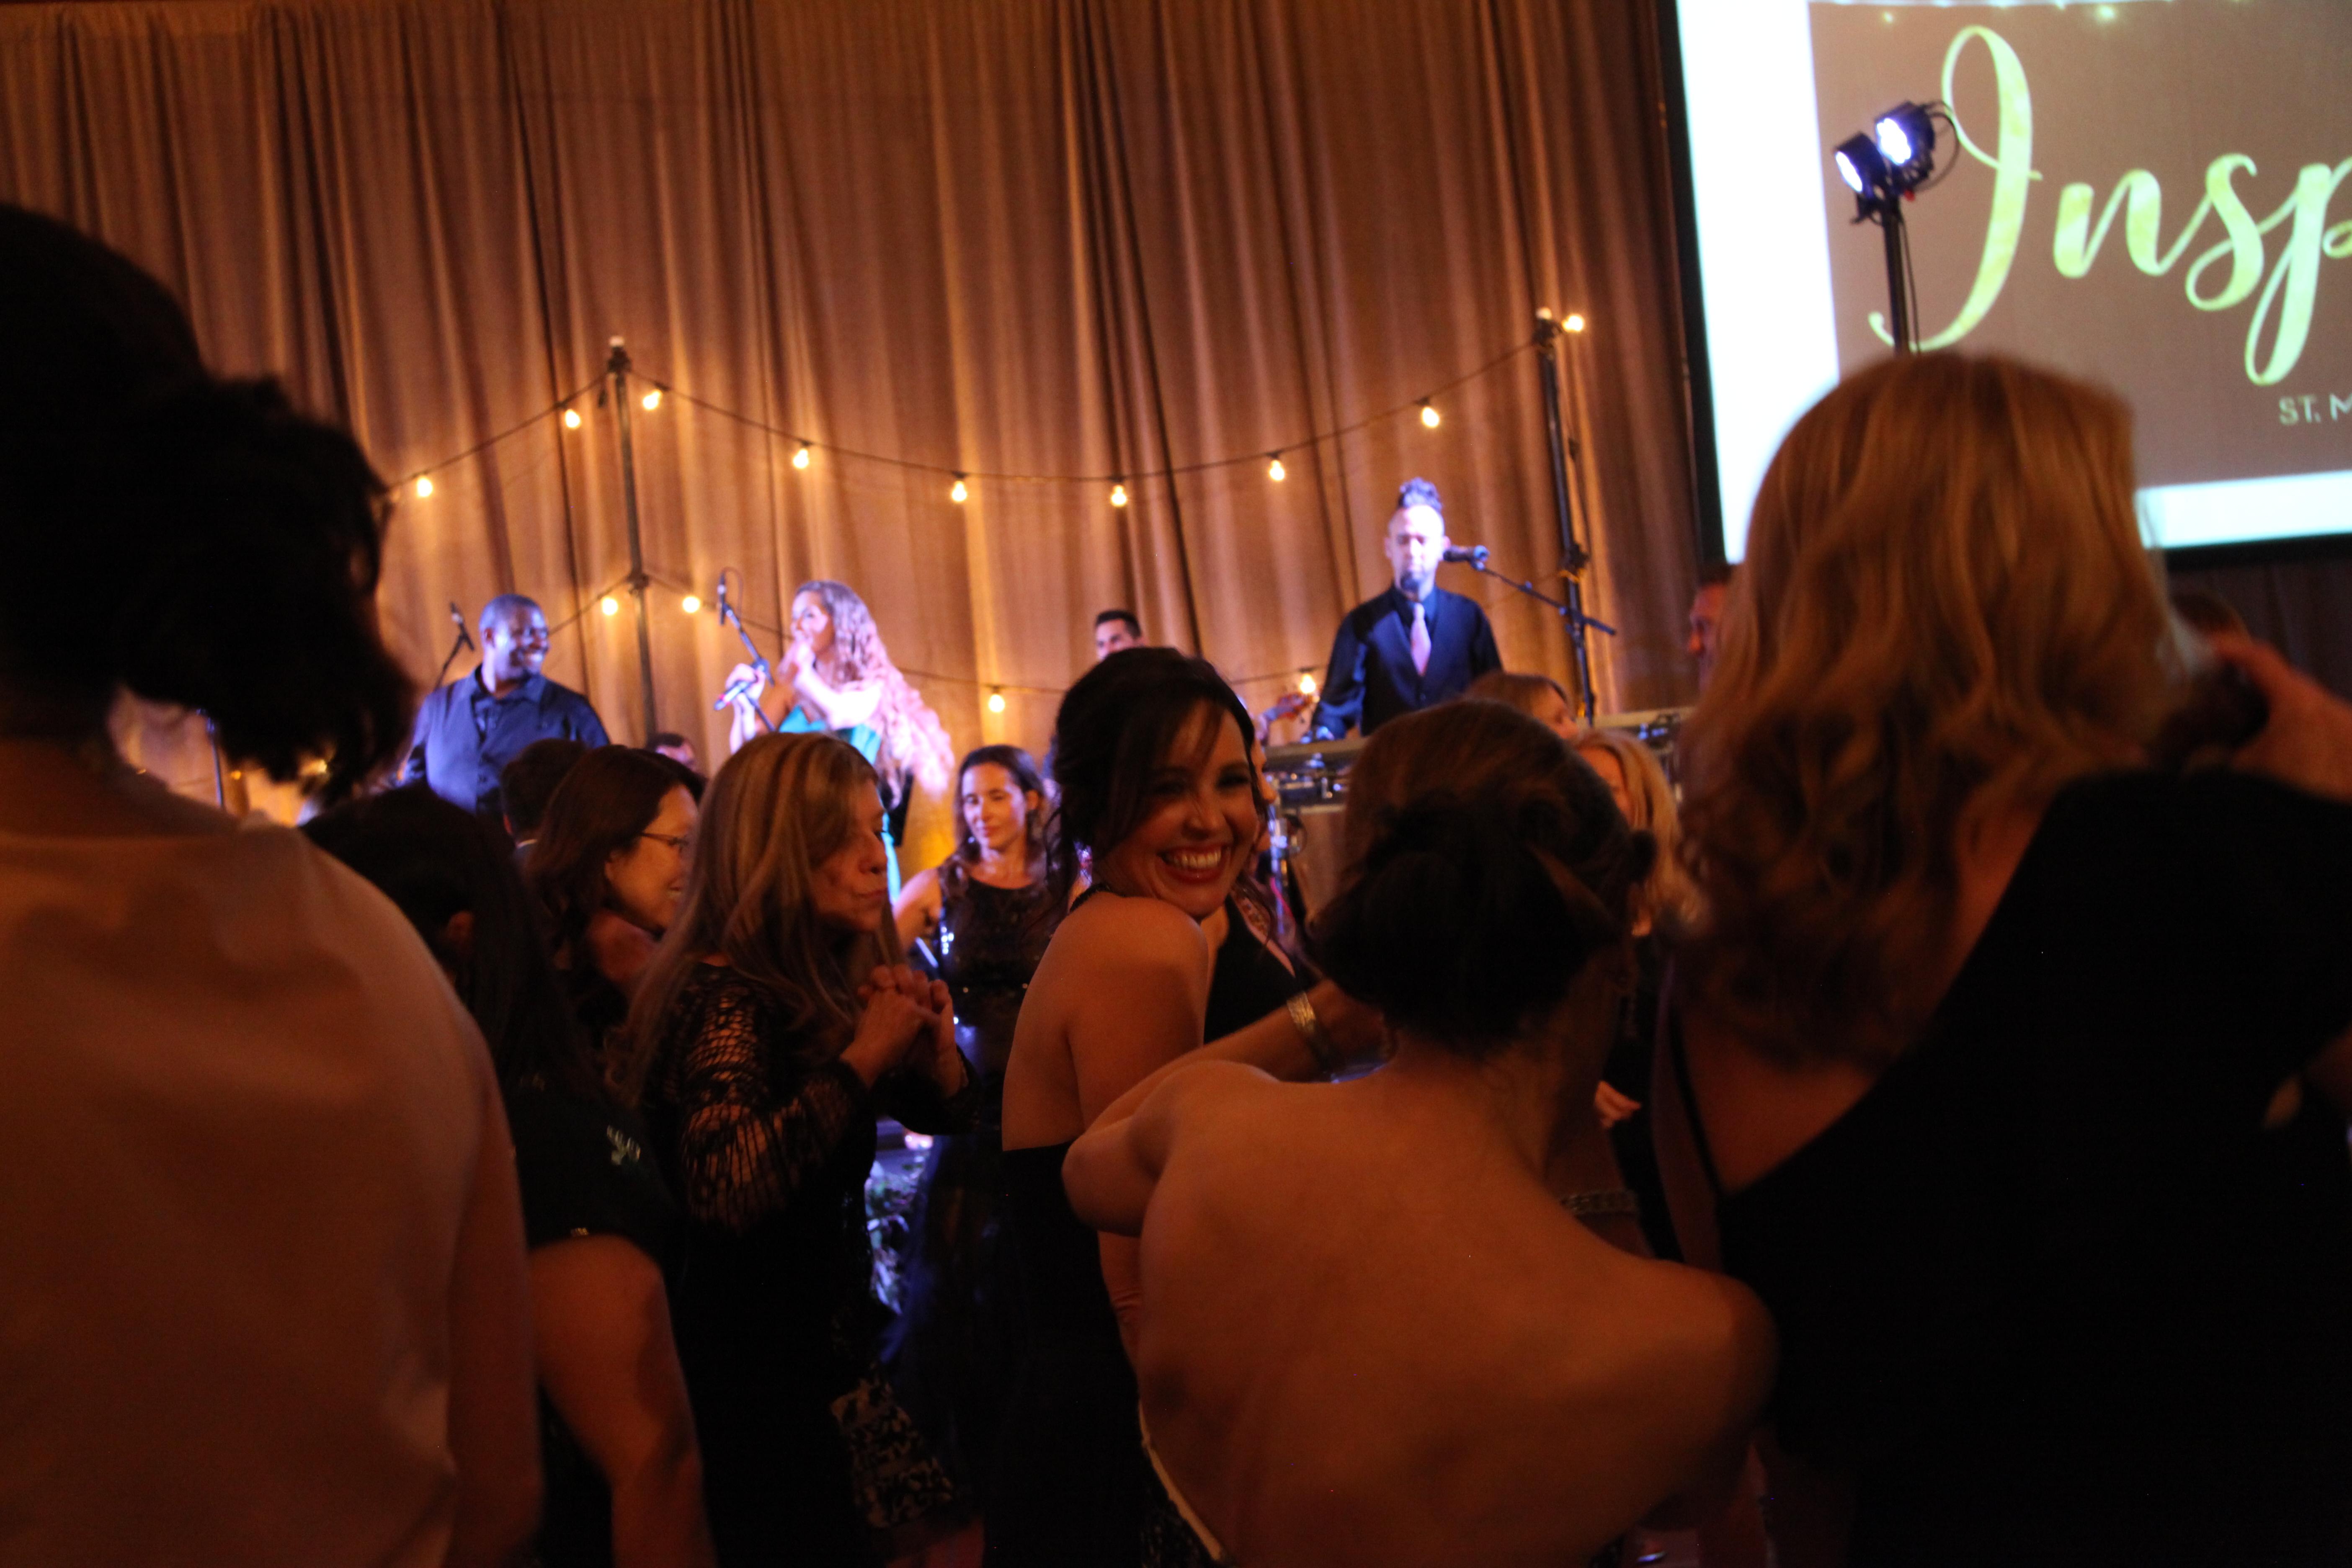 Professional Wedding Band